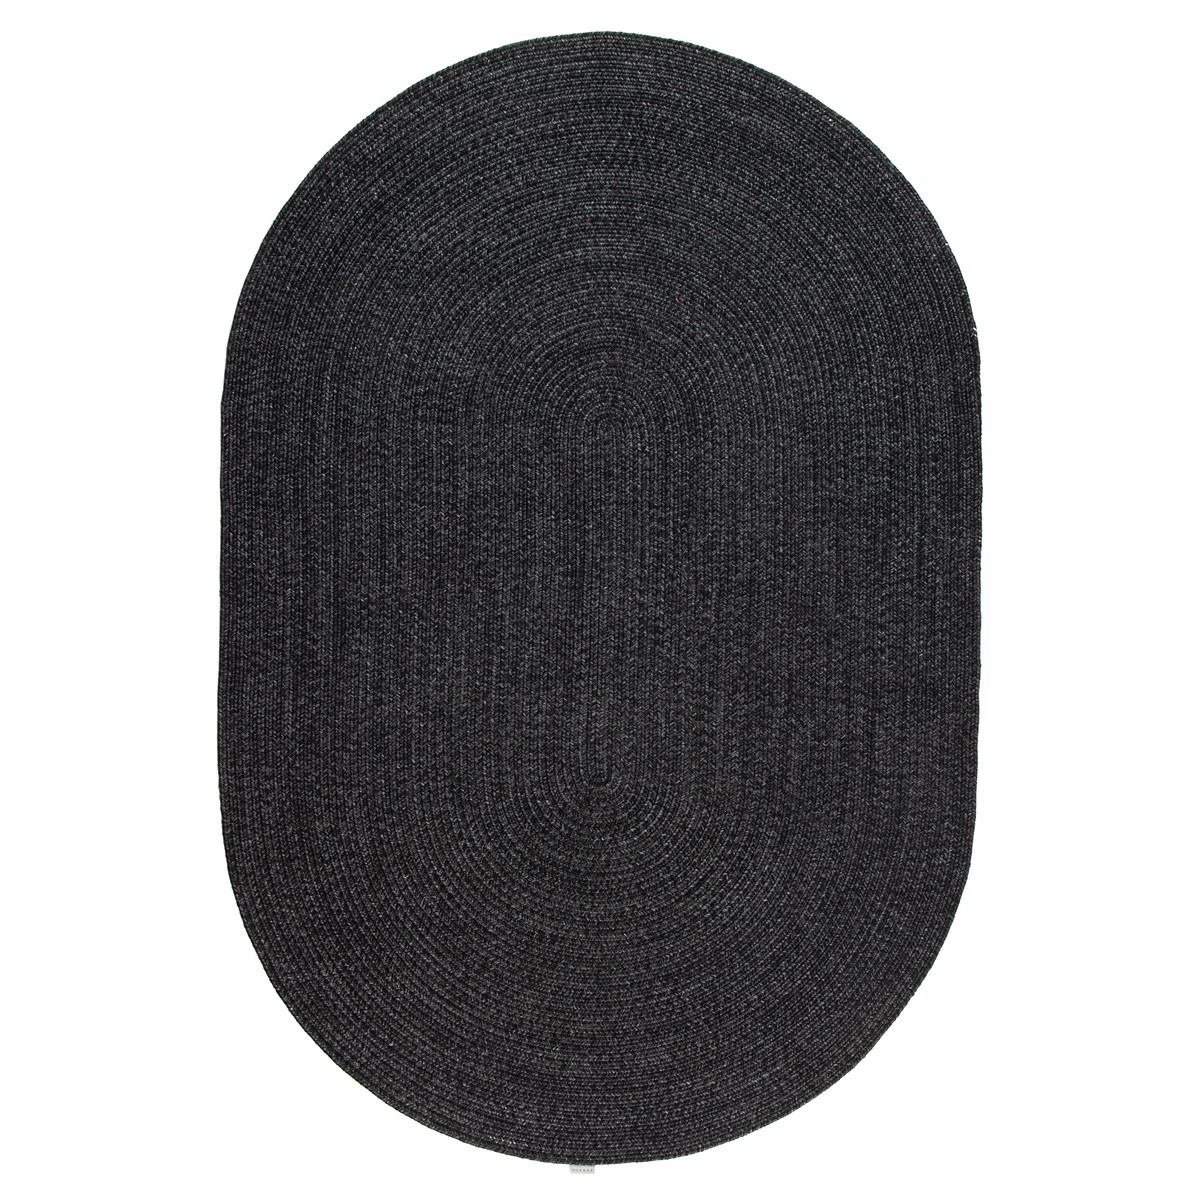 Tapis de salon en Polypropylène Gris anthracite 120x120 cm